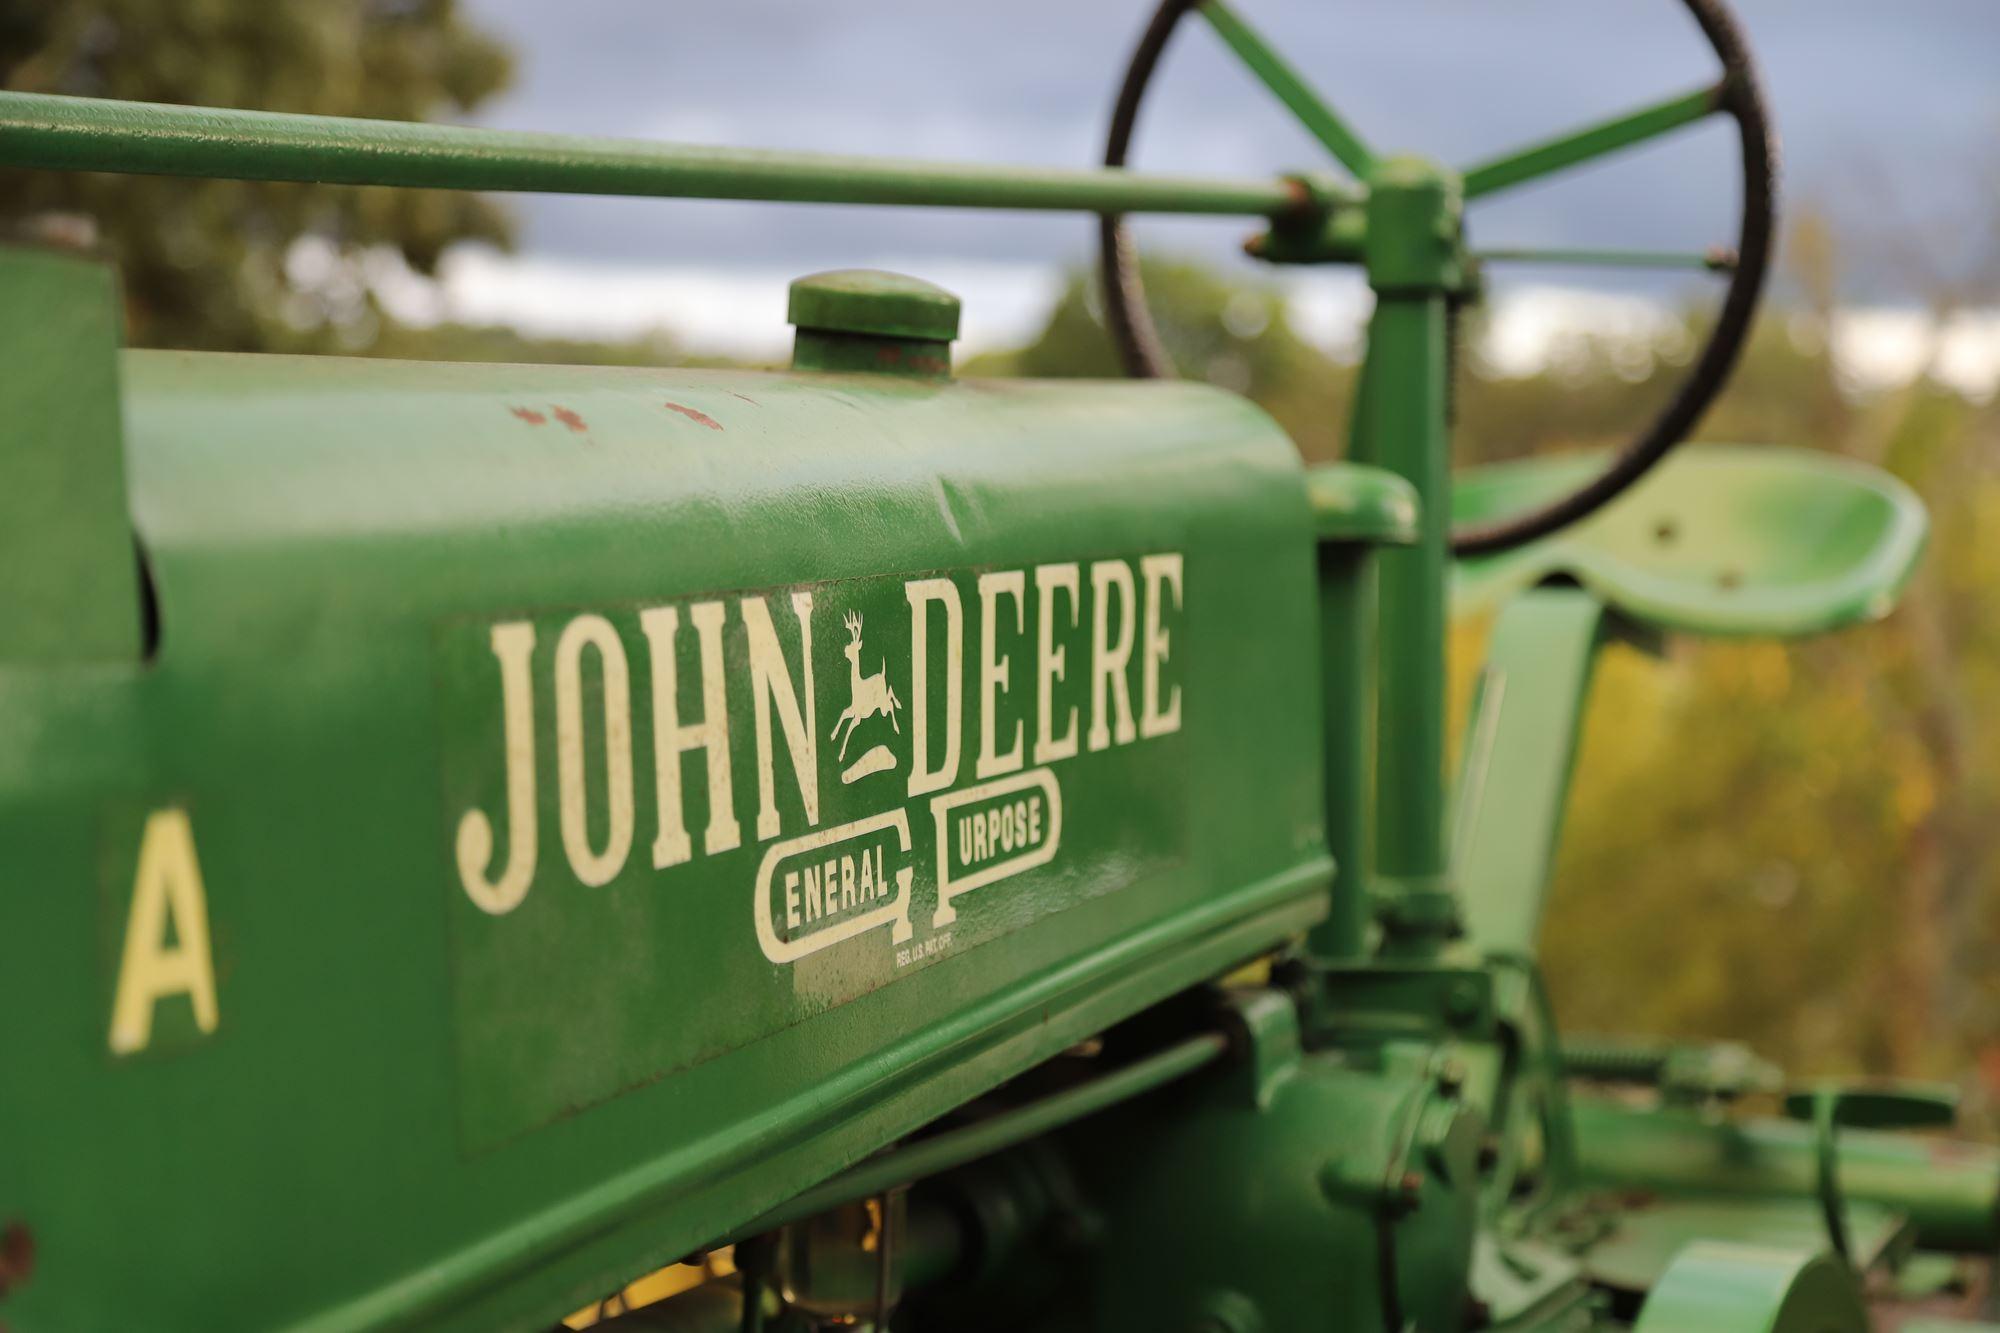 Antique Engines & Tractors